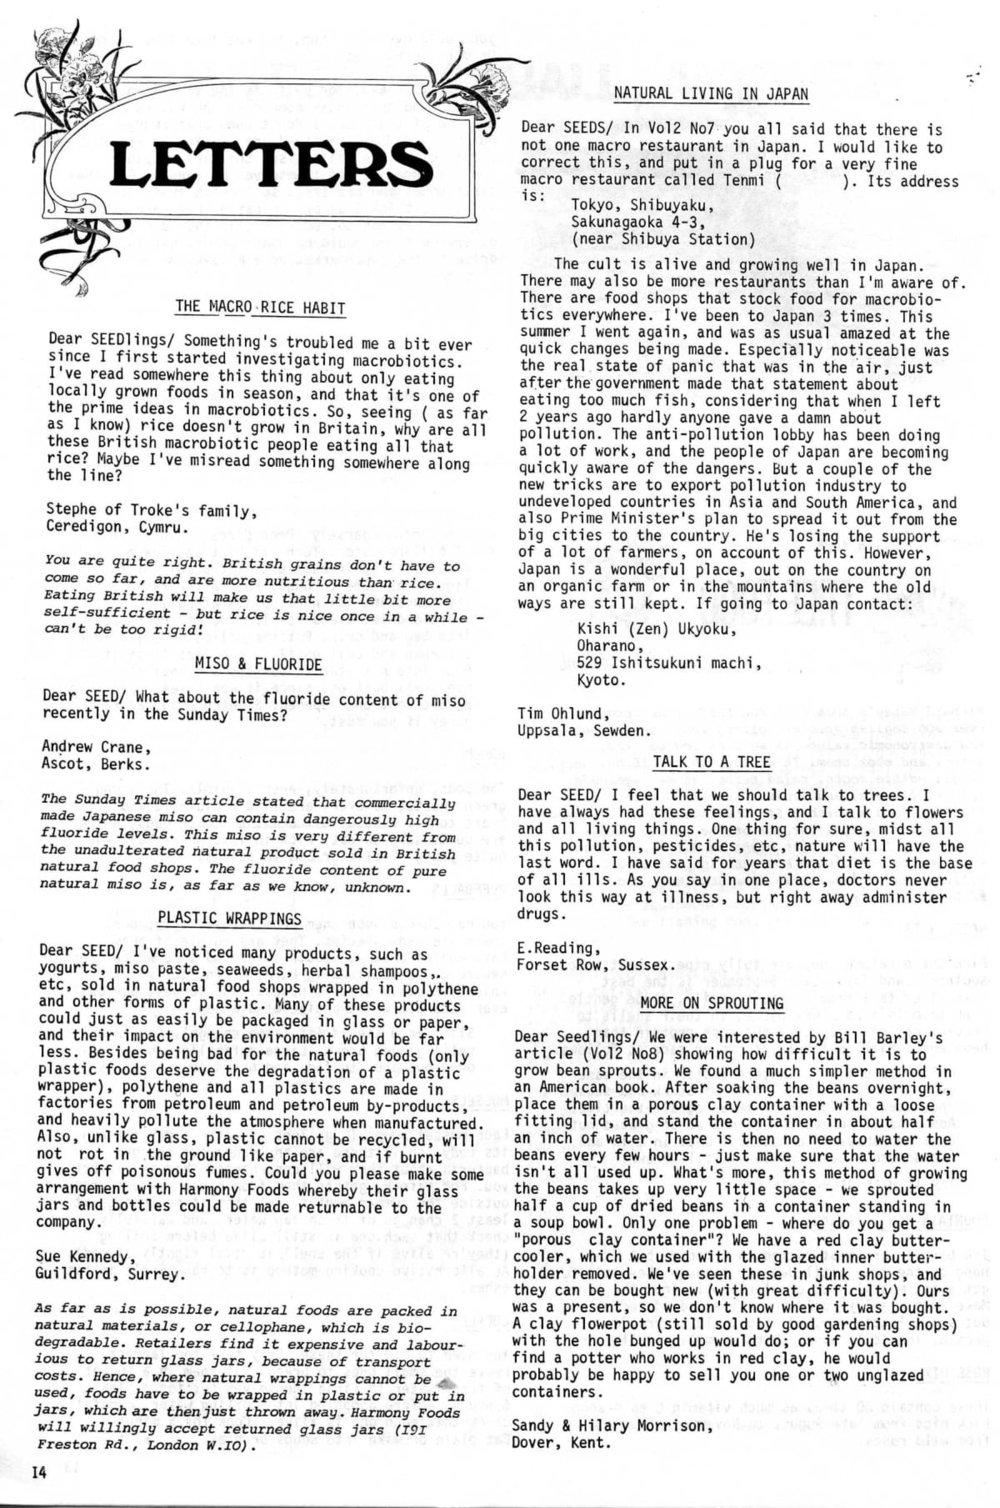 seed-v2-n10-oct1973-14.jpg